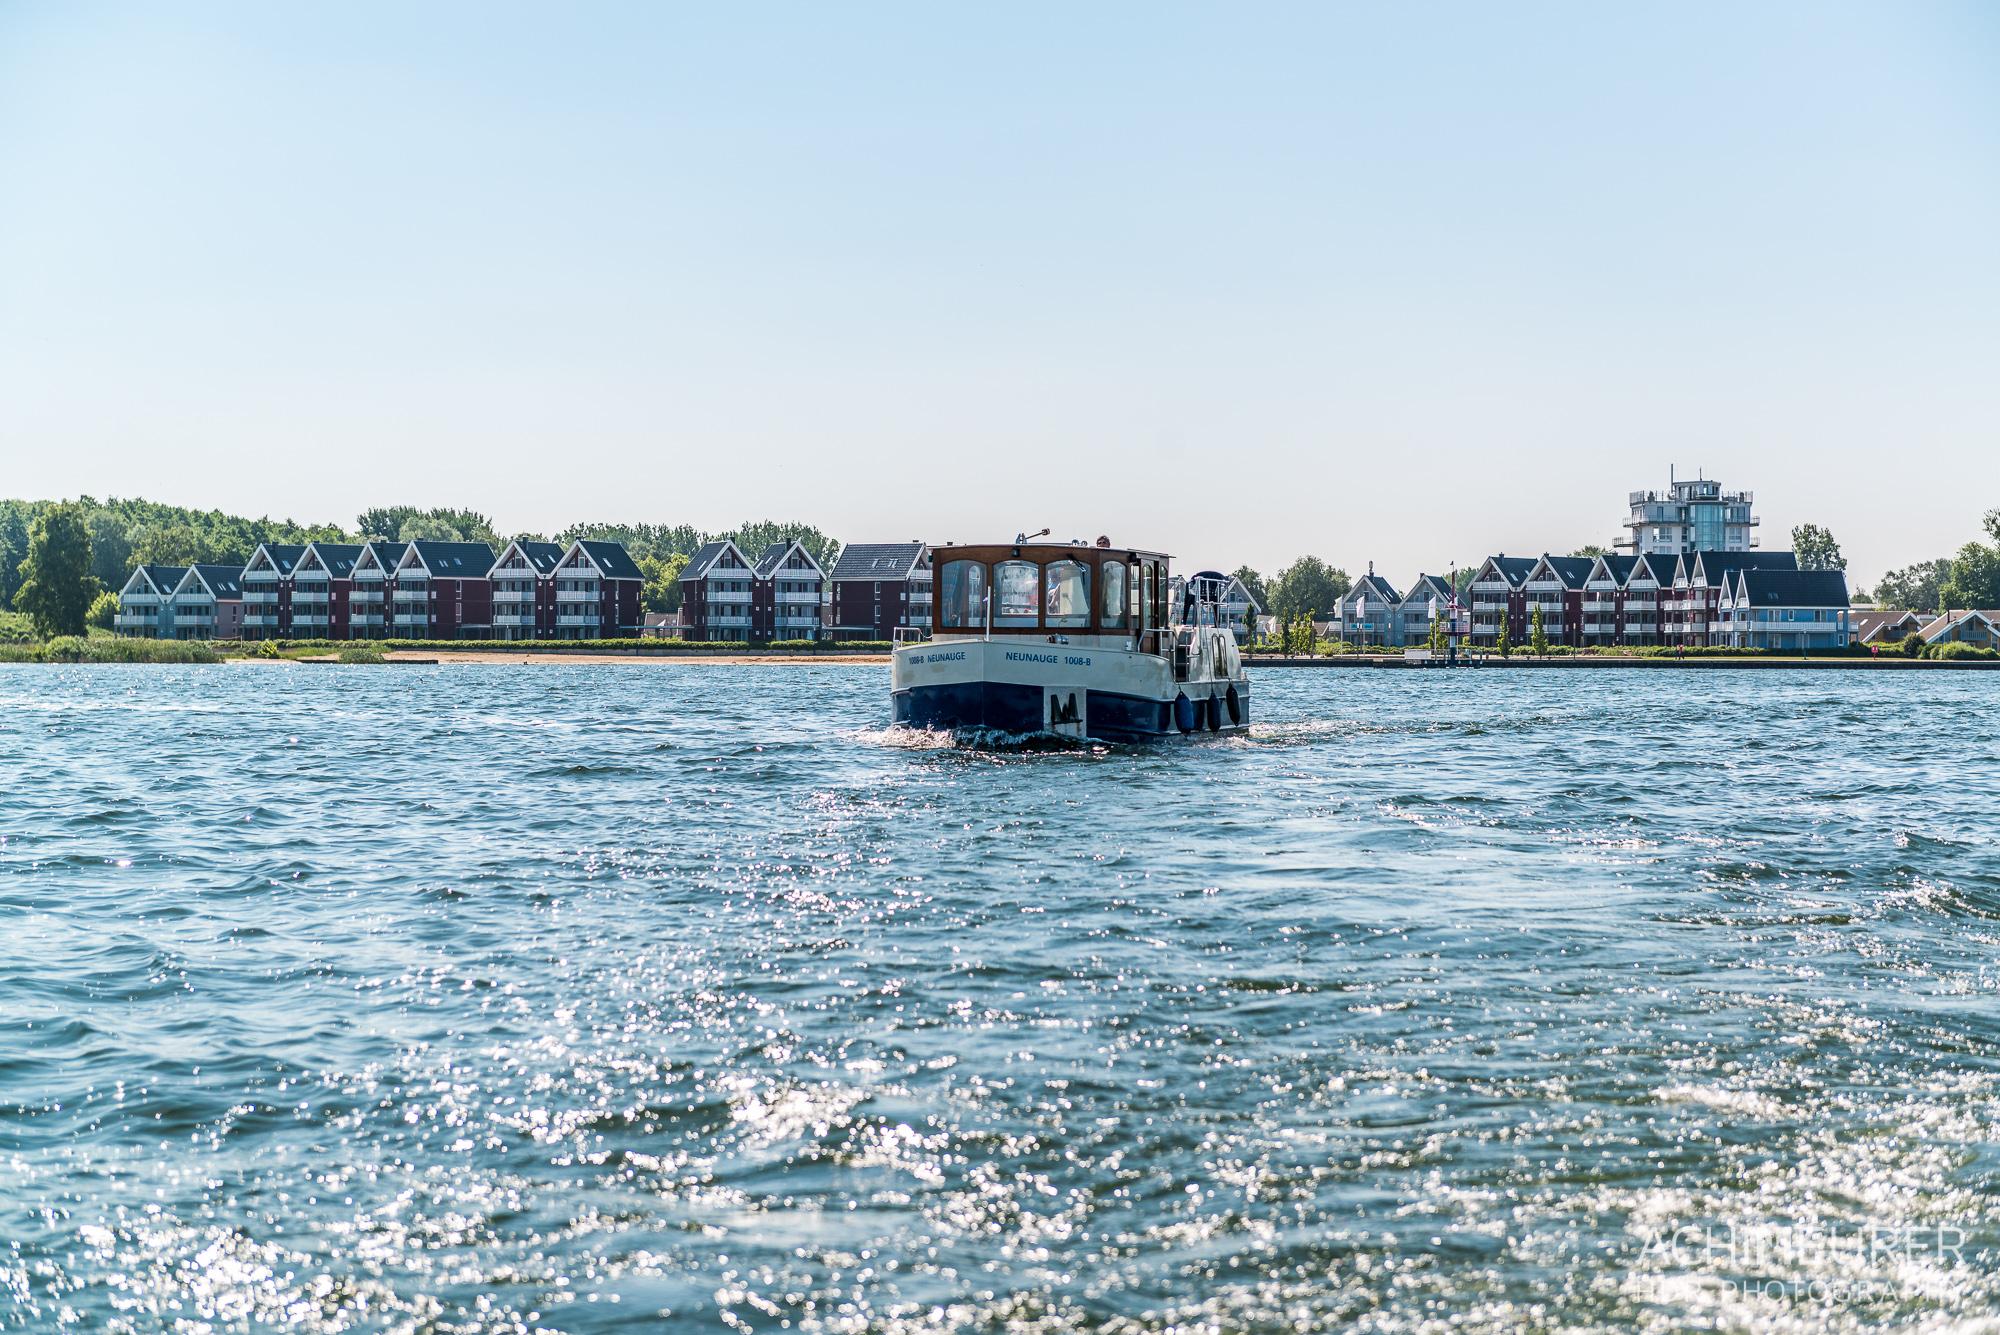 Hausboot-Kuhnle-Mueritz-Mecklenburg-Vorpommern-See_3534